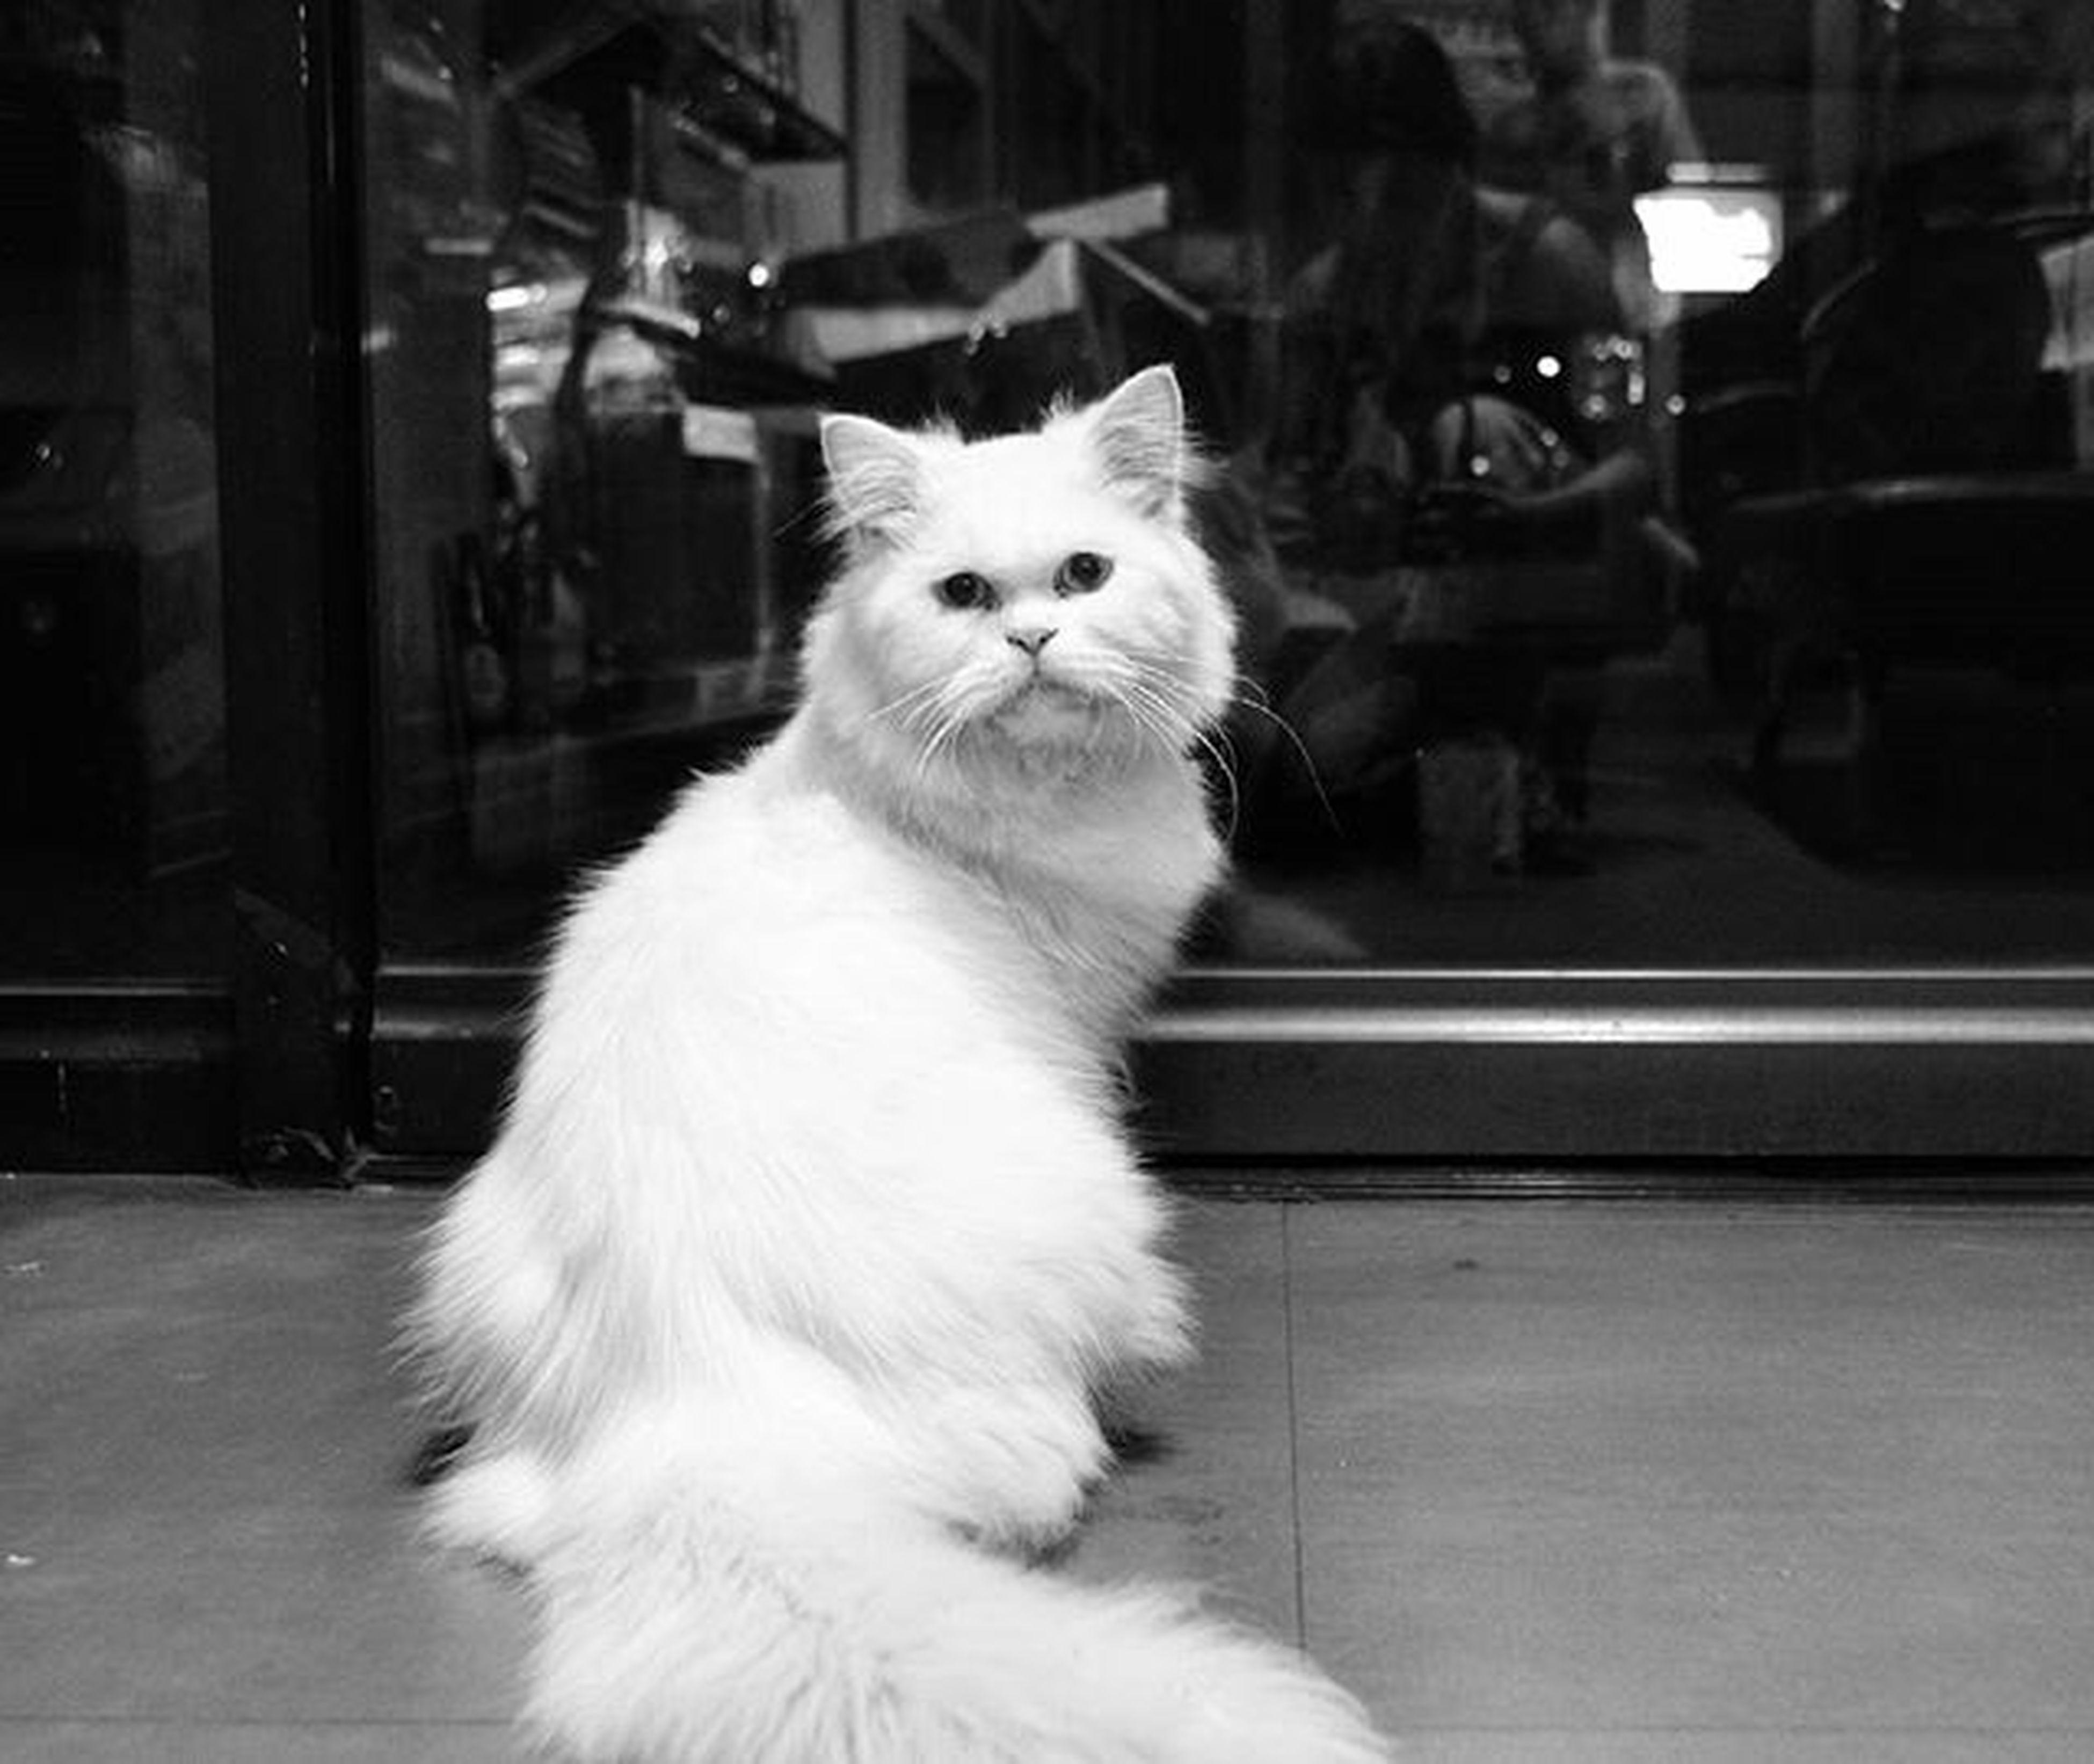 I see you. Baby Kitty Cat Silverpersian Bnw Nostalgia Petcityzen